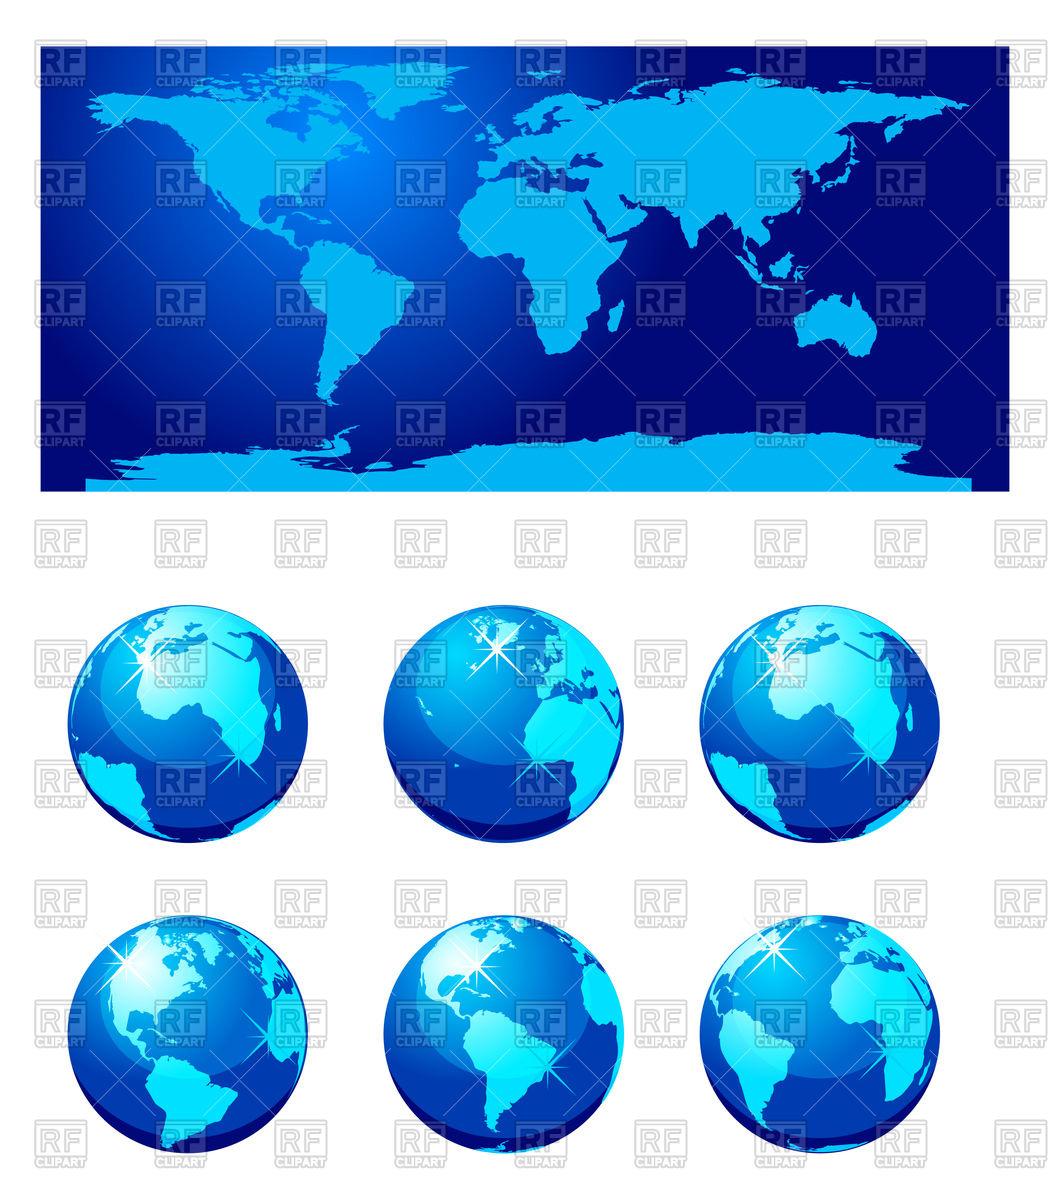 World globe map clipart image free Set of world globe and world map Vector Image #74197 – RFclipart image free